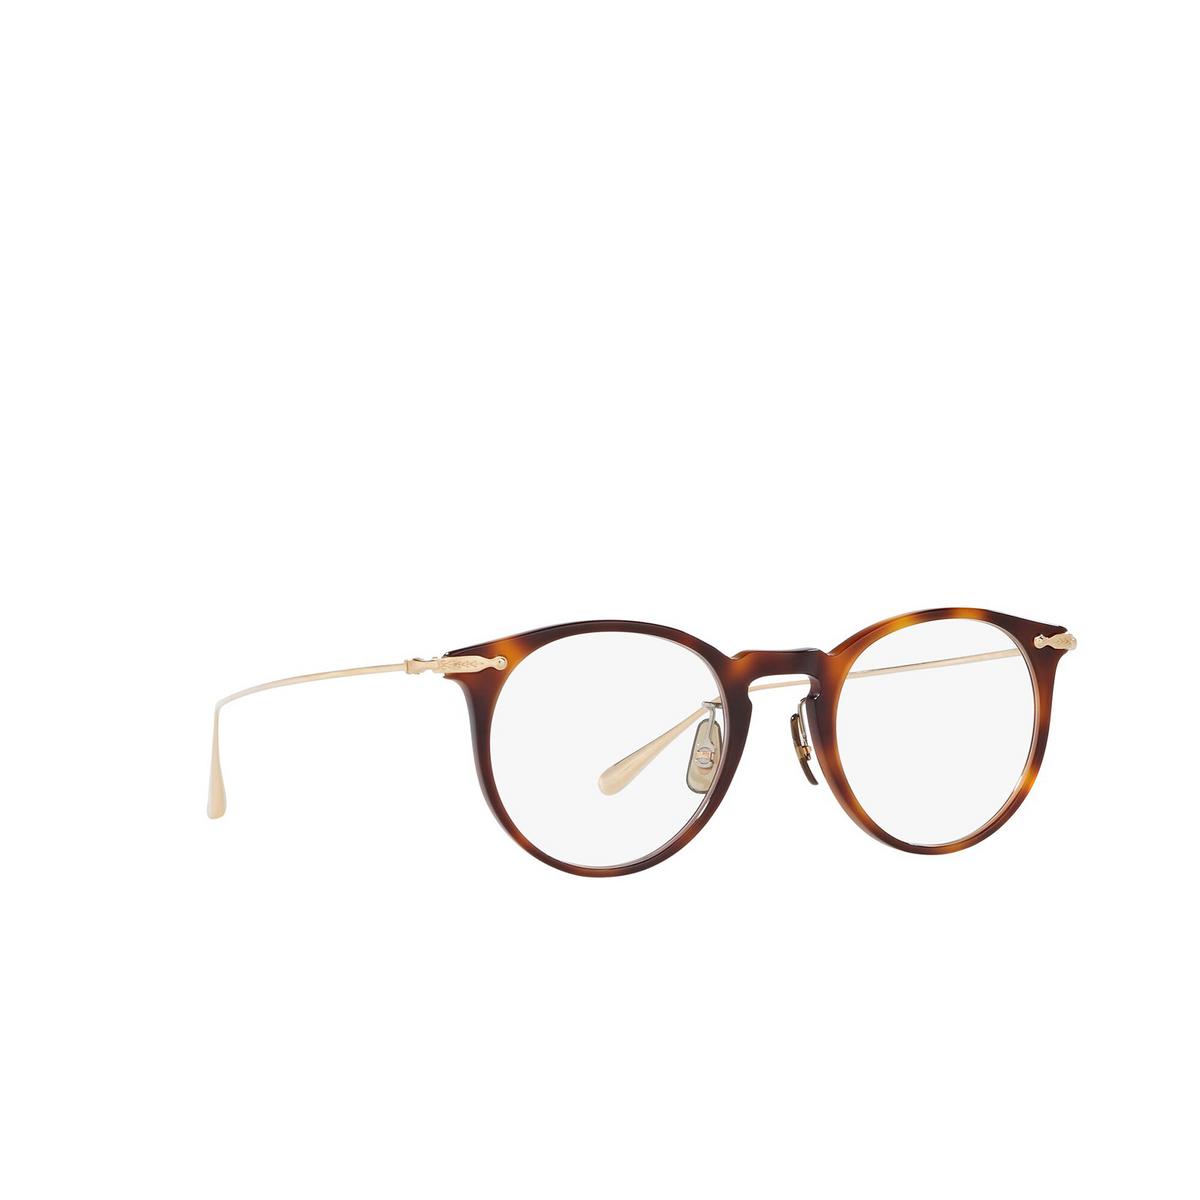 Oliver Peoples® Round Eyeglasses: Marret OV5343D color Tortoise 1007 - three-quarters view.